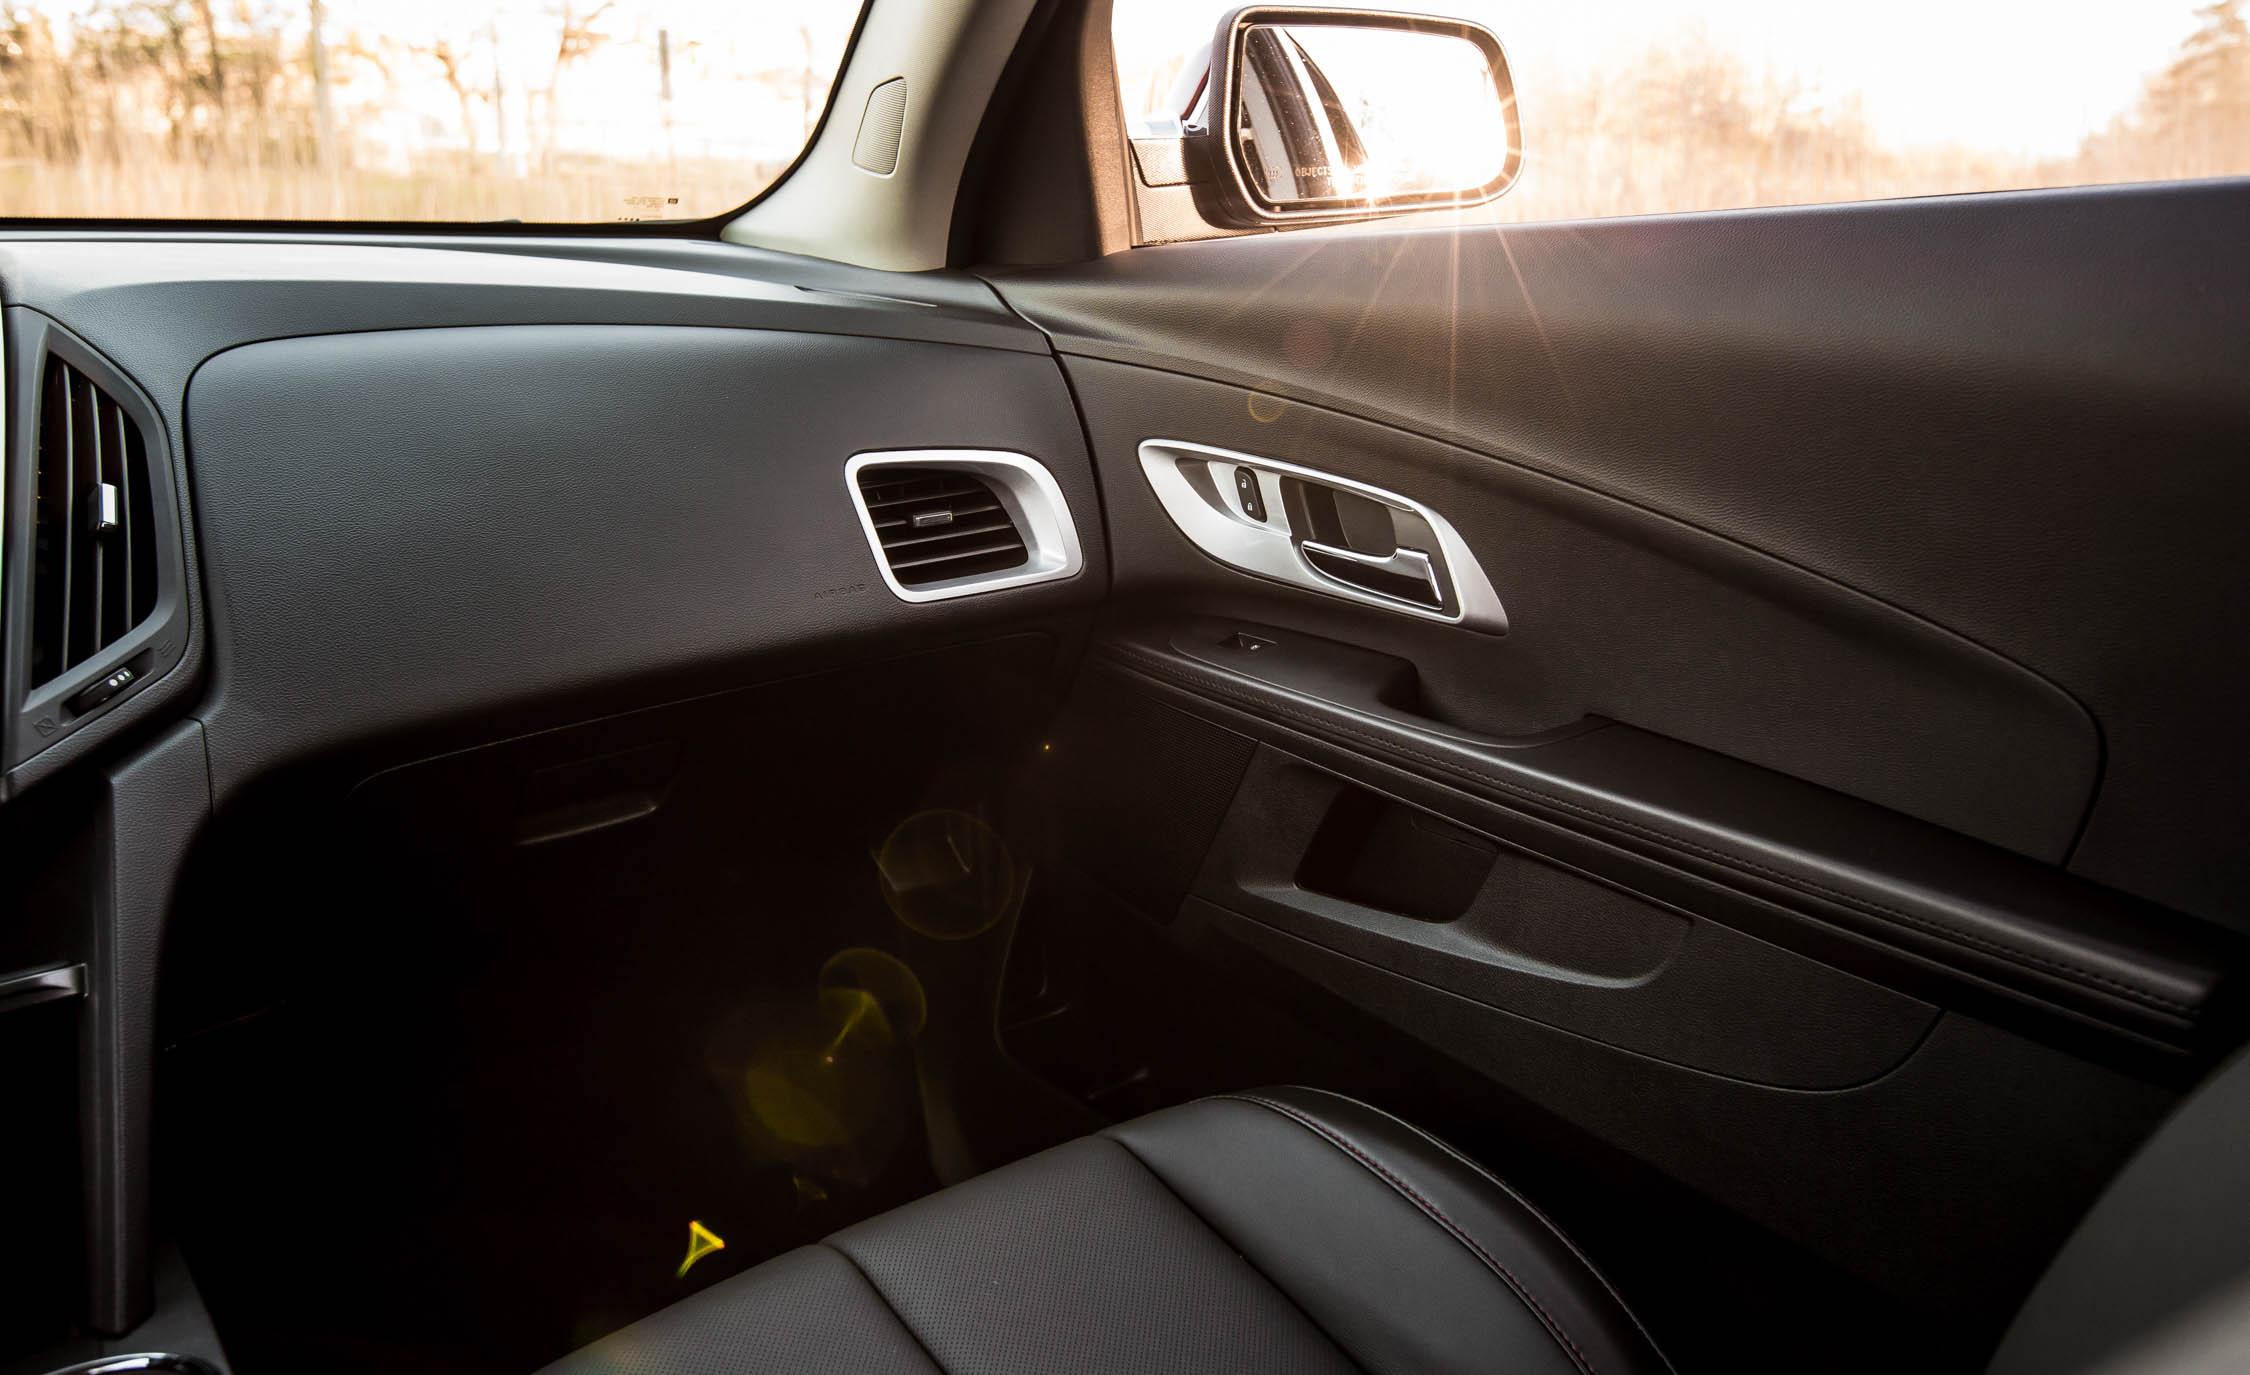 2016 Chevrolet Equinox LTZ Interior Front Passenger Dash